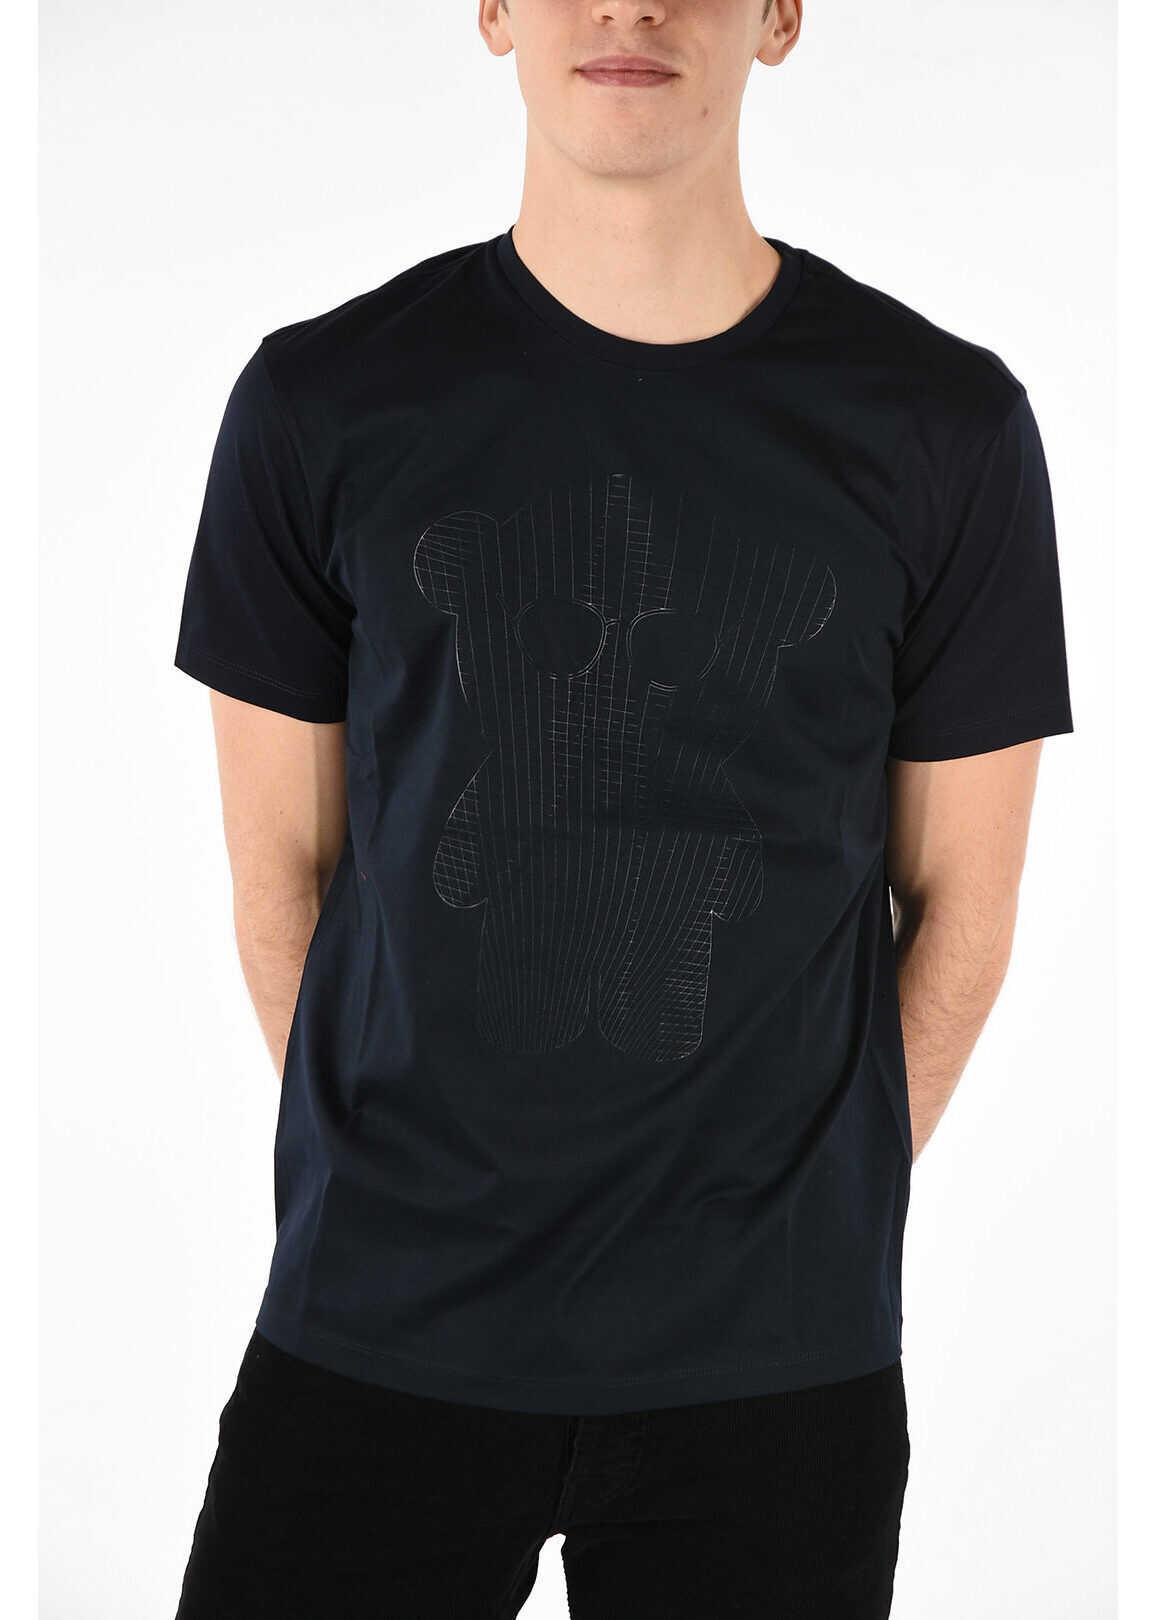 Armani EMPORIO Teddy Bear Printed T-shirt BLUE